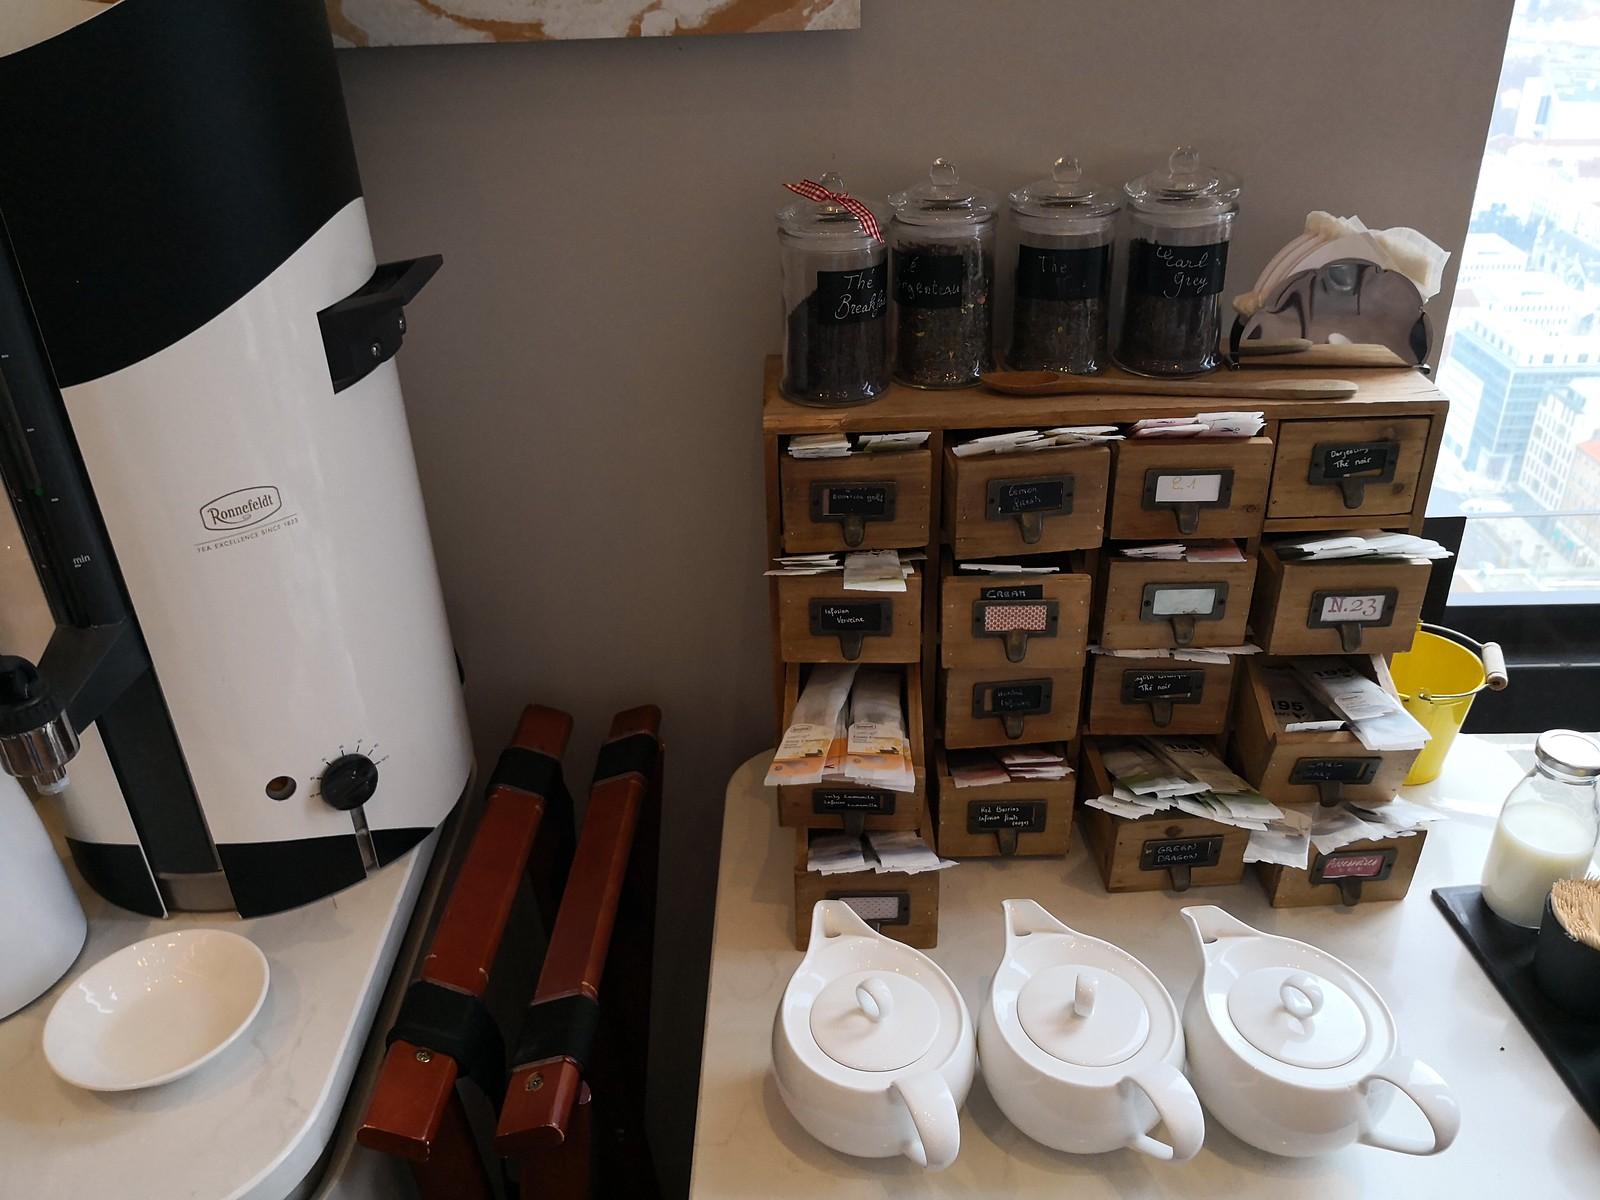 Tea and hot water dispenser